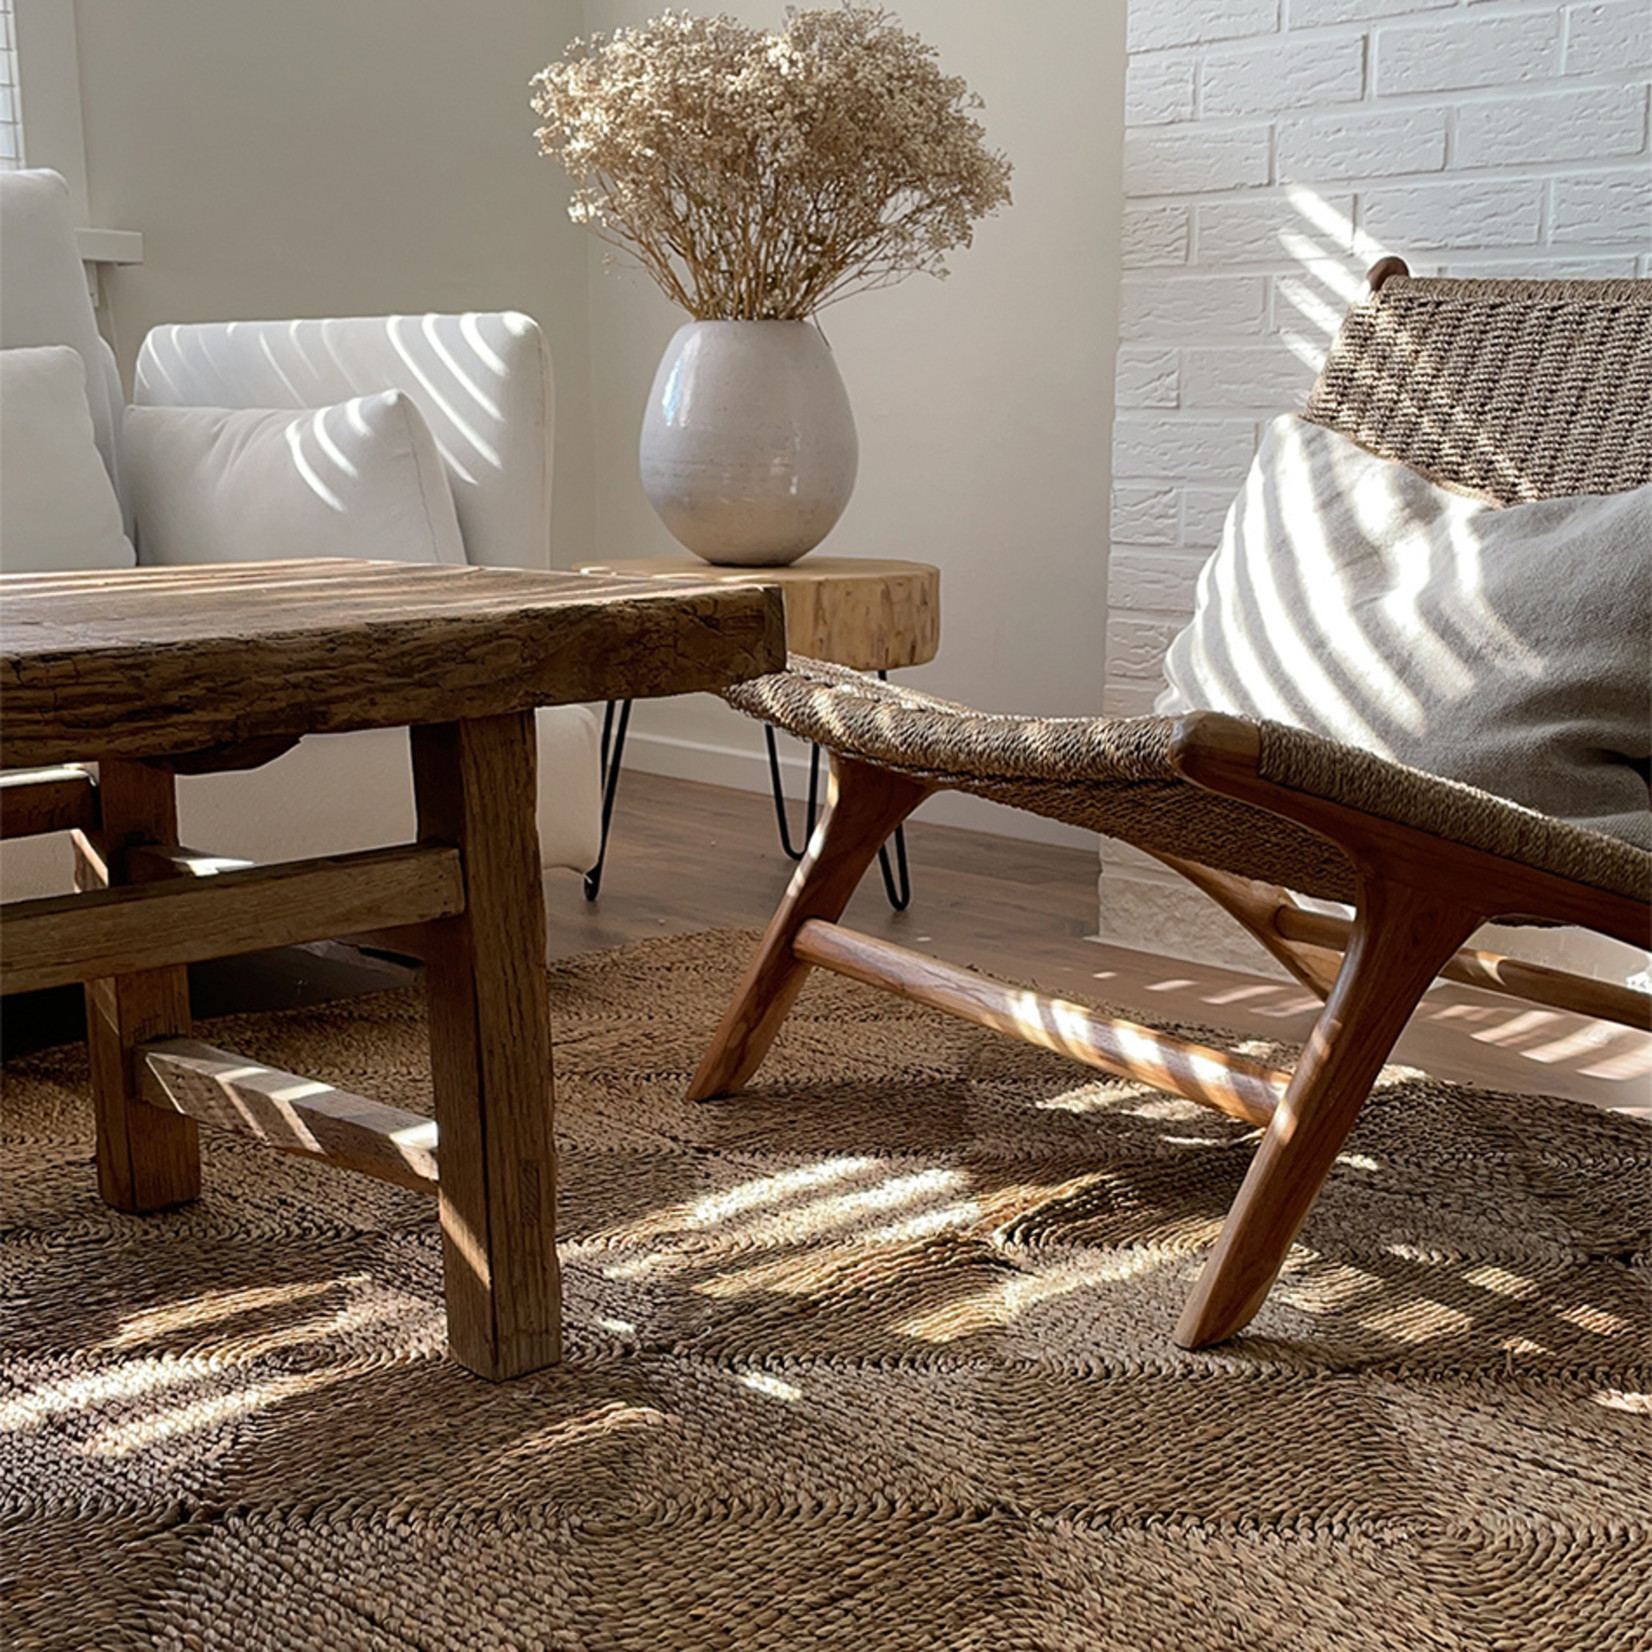 Carpet seagrass